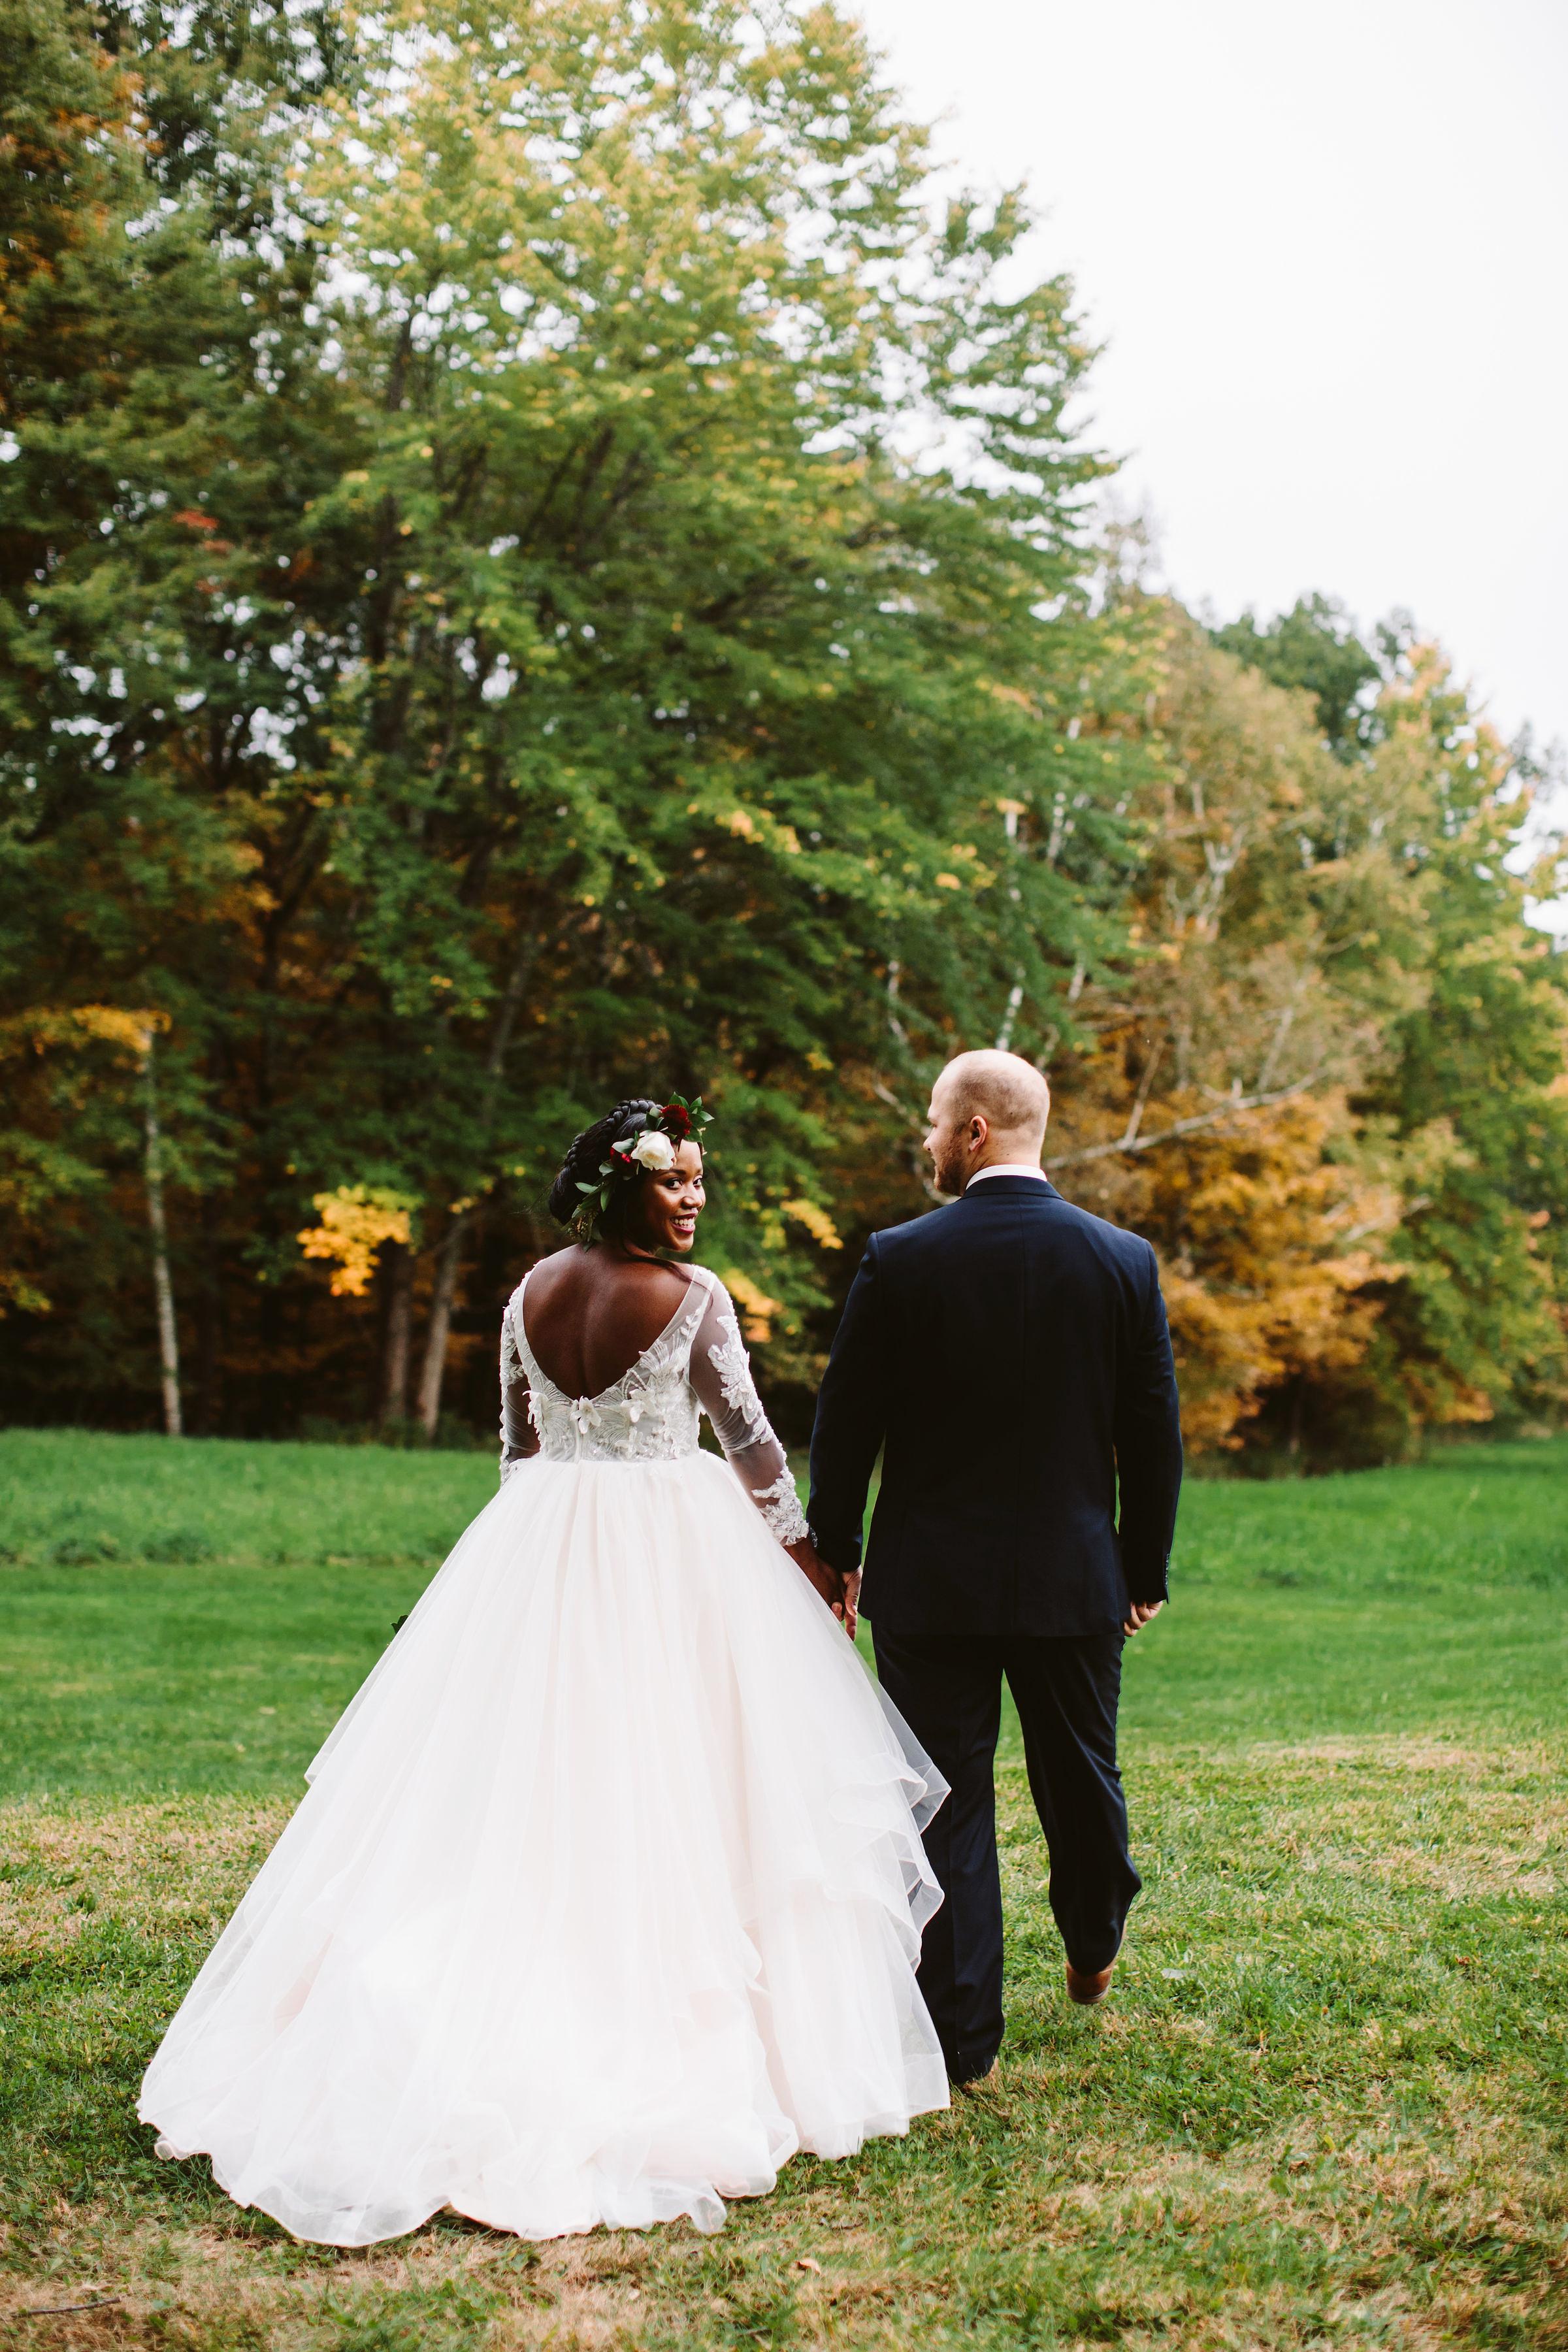 rivka aaron wedding couple bride groom walking away outdoors